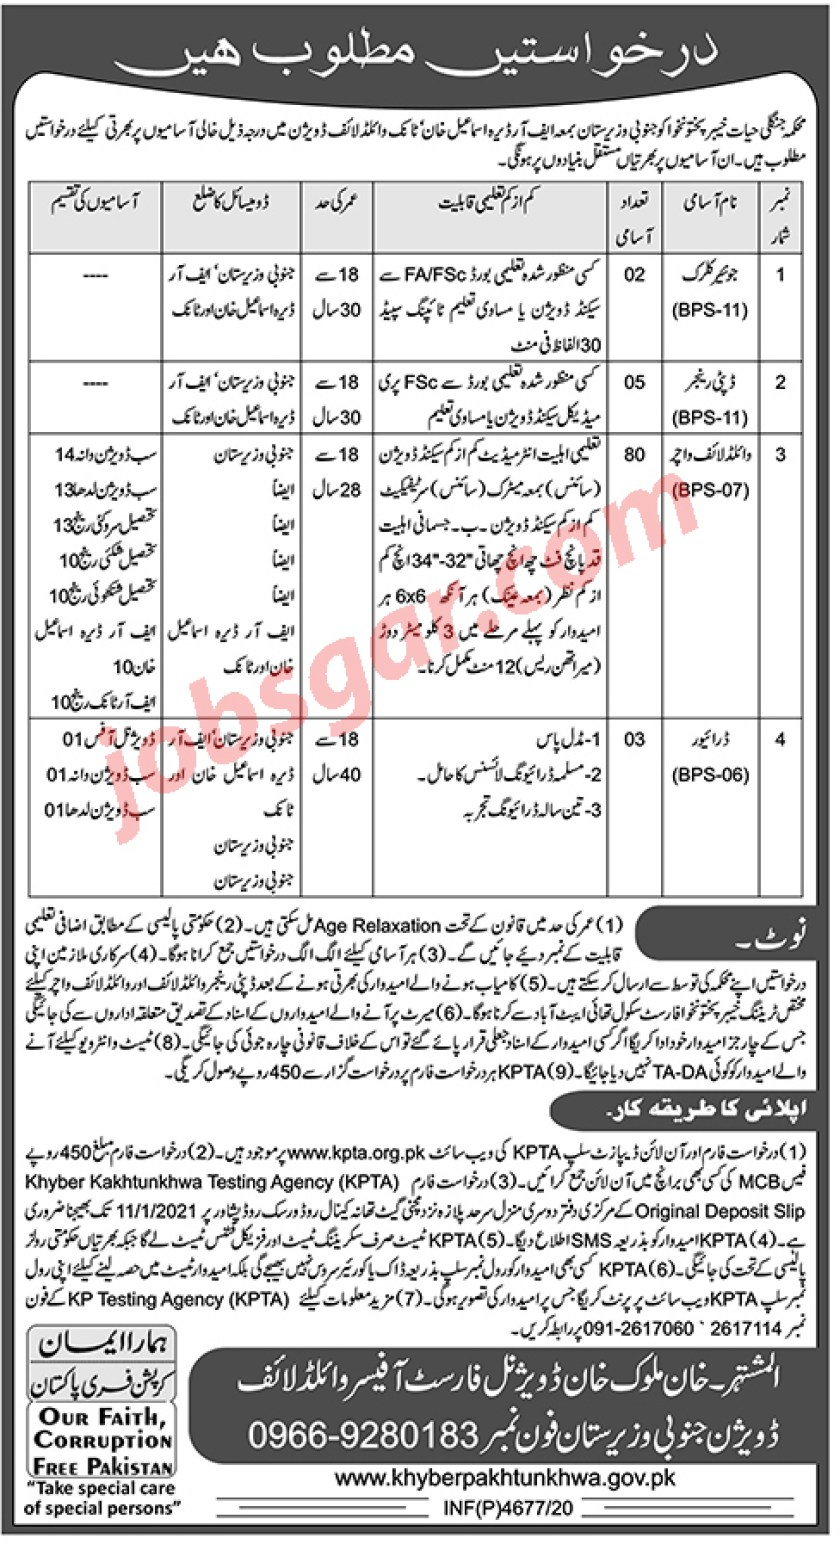 Wildlife Department South Waziristan Khyber Pakhtunkhwa Jobs 2020